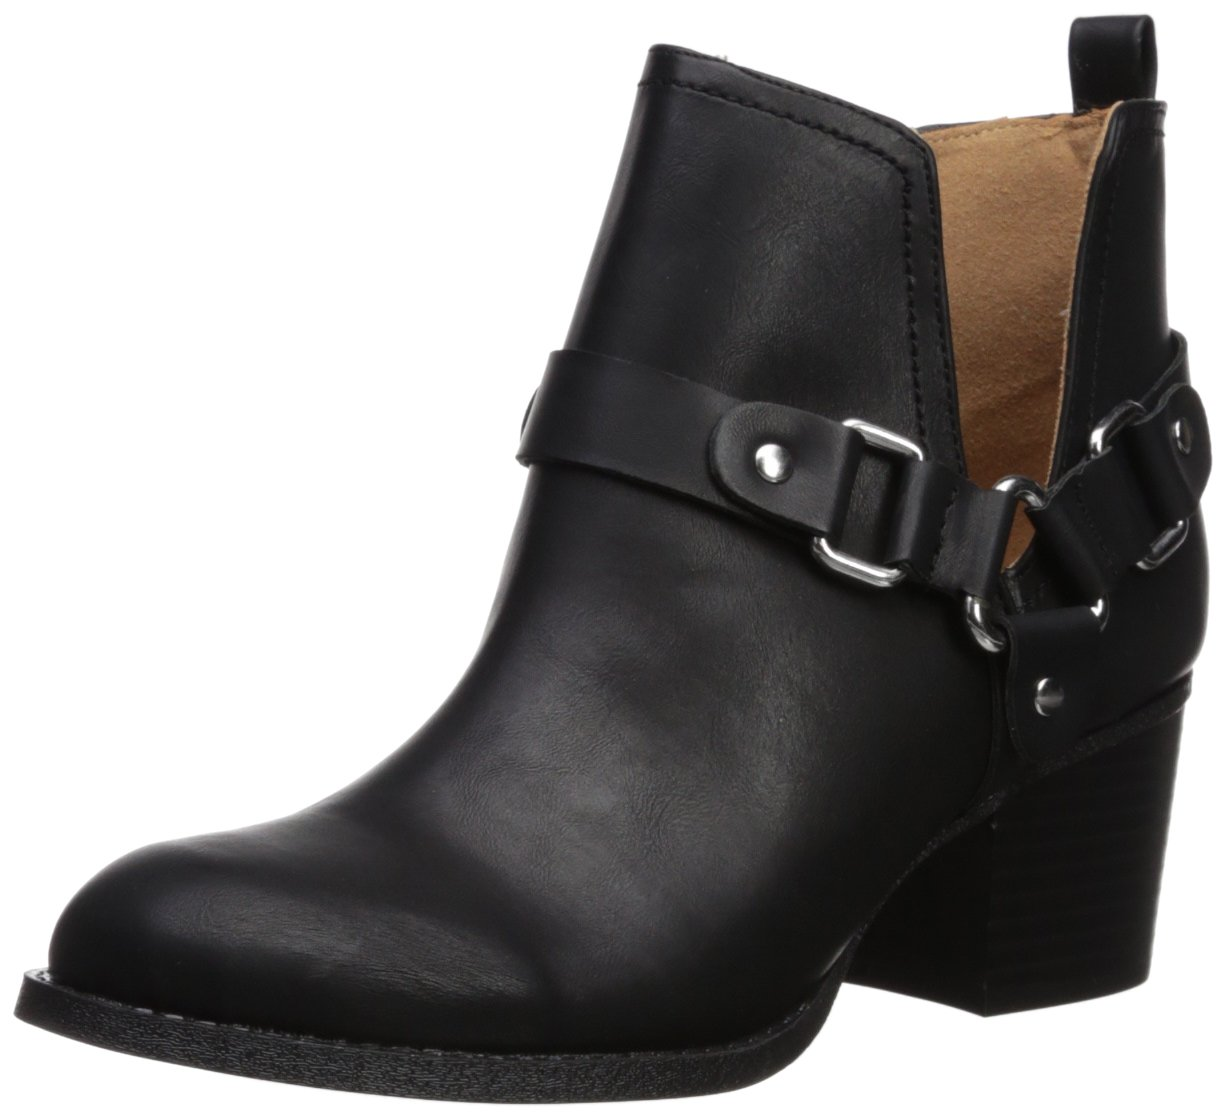 Madden Girl Women's Finian Ankle Boot B074Z2C3BP 9 B(M) US Black Paris